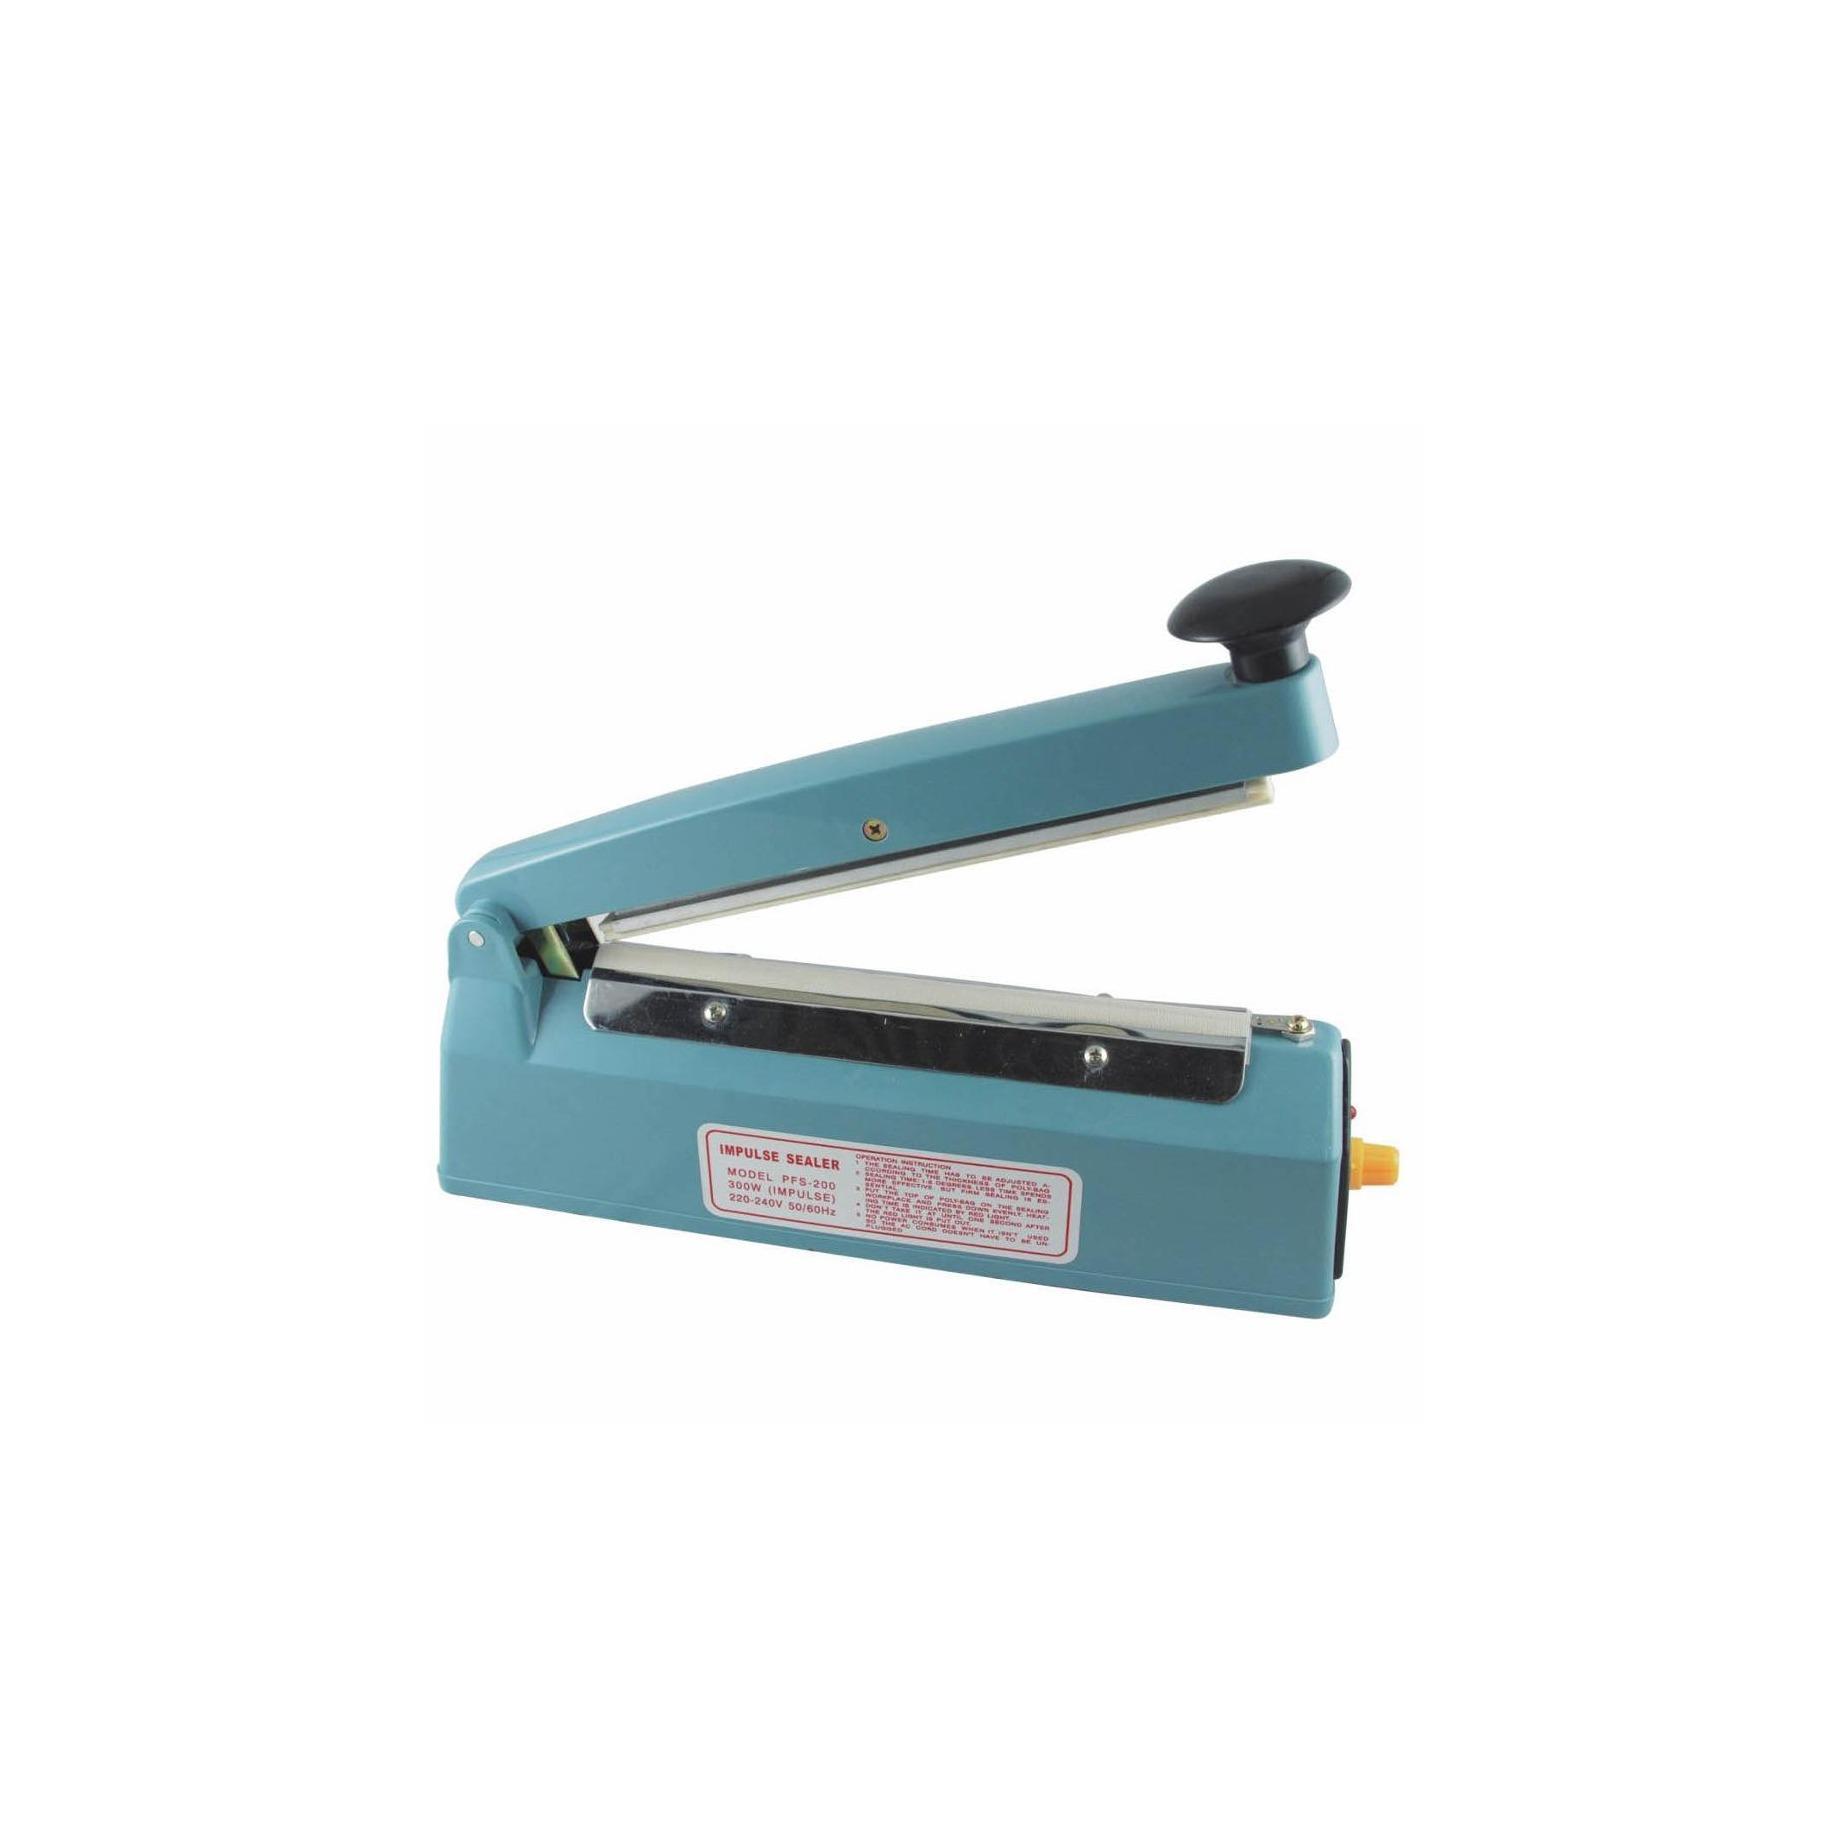 Home Lux Impulse Sealer PFS 300 Alat Mesin Press Plastik 30 Cm